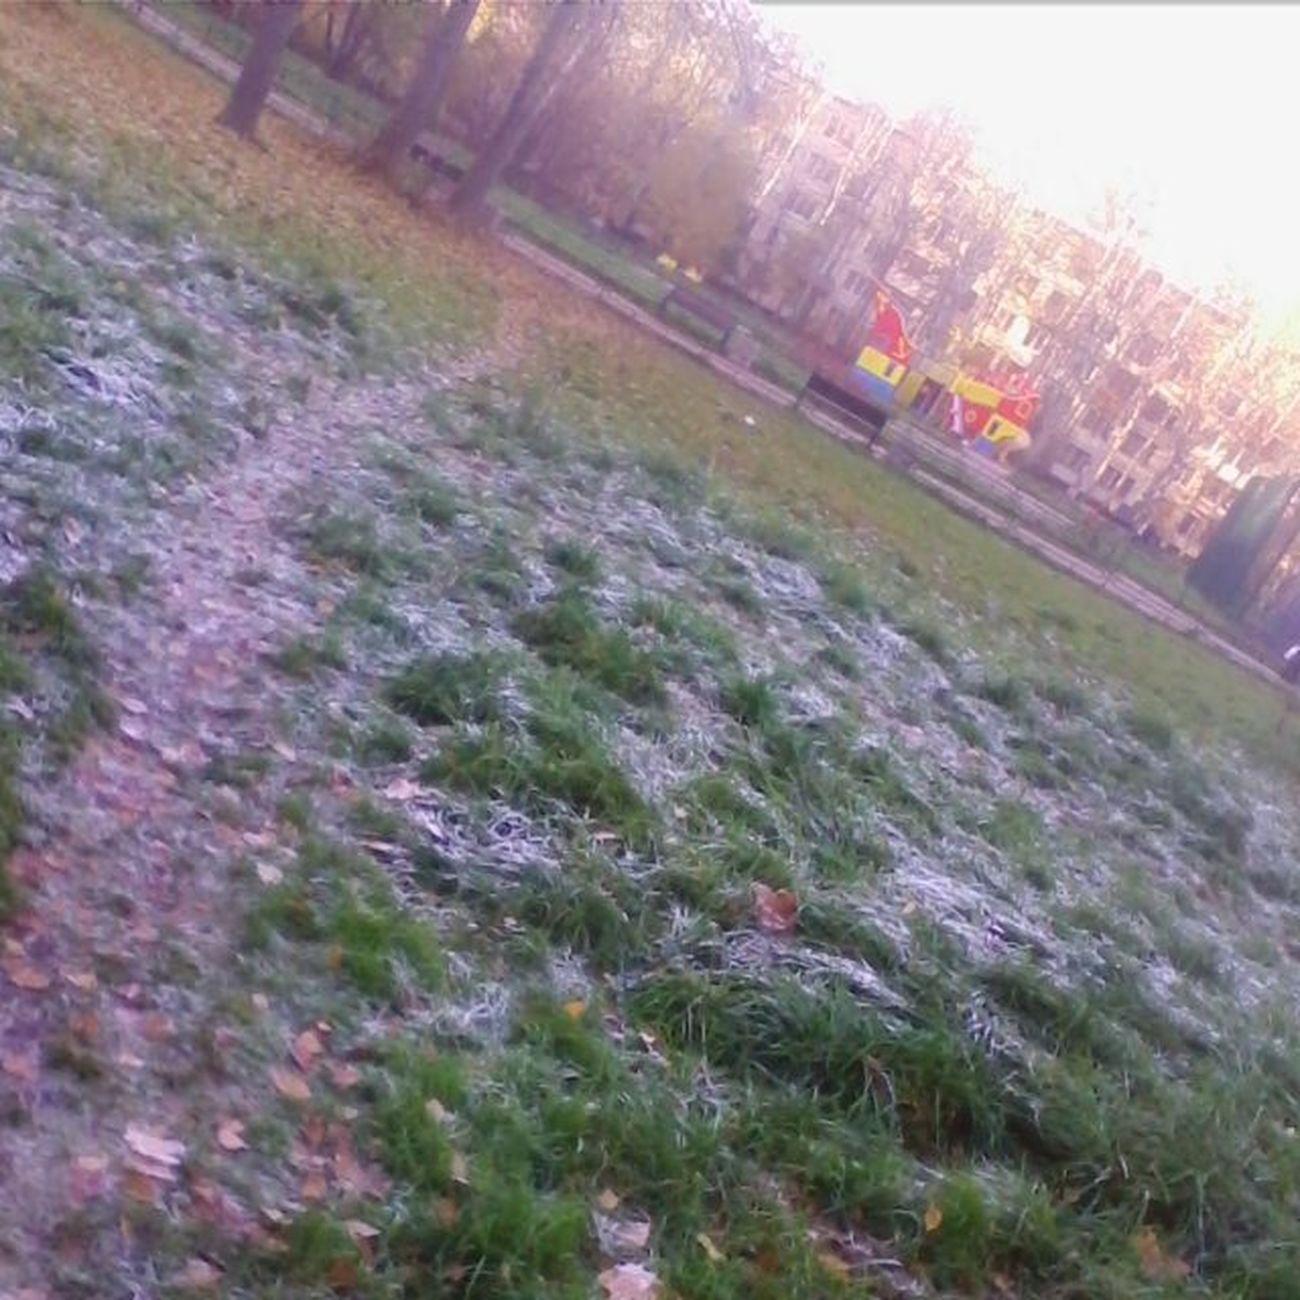 Легкий снег в Питере Snowinstpetersburg Autumm Grass Light snow in St. Petersburg Snowinstpetersburg Autumm Grass Likeboxsaratov